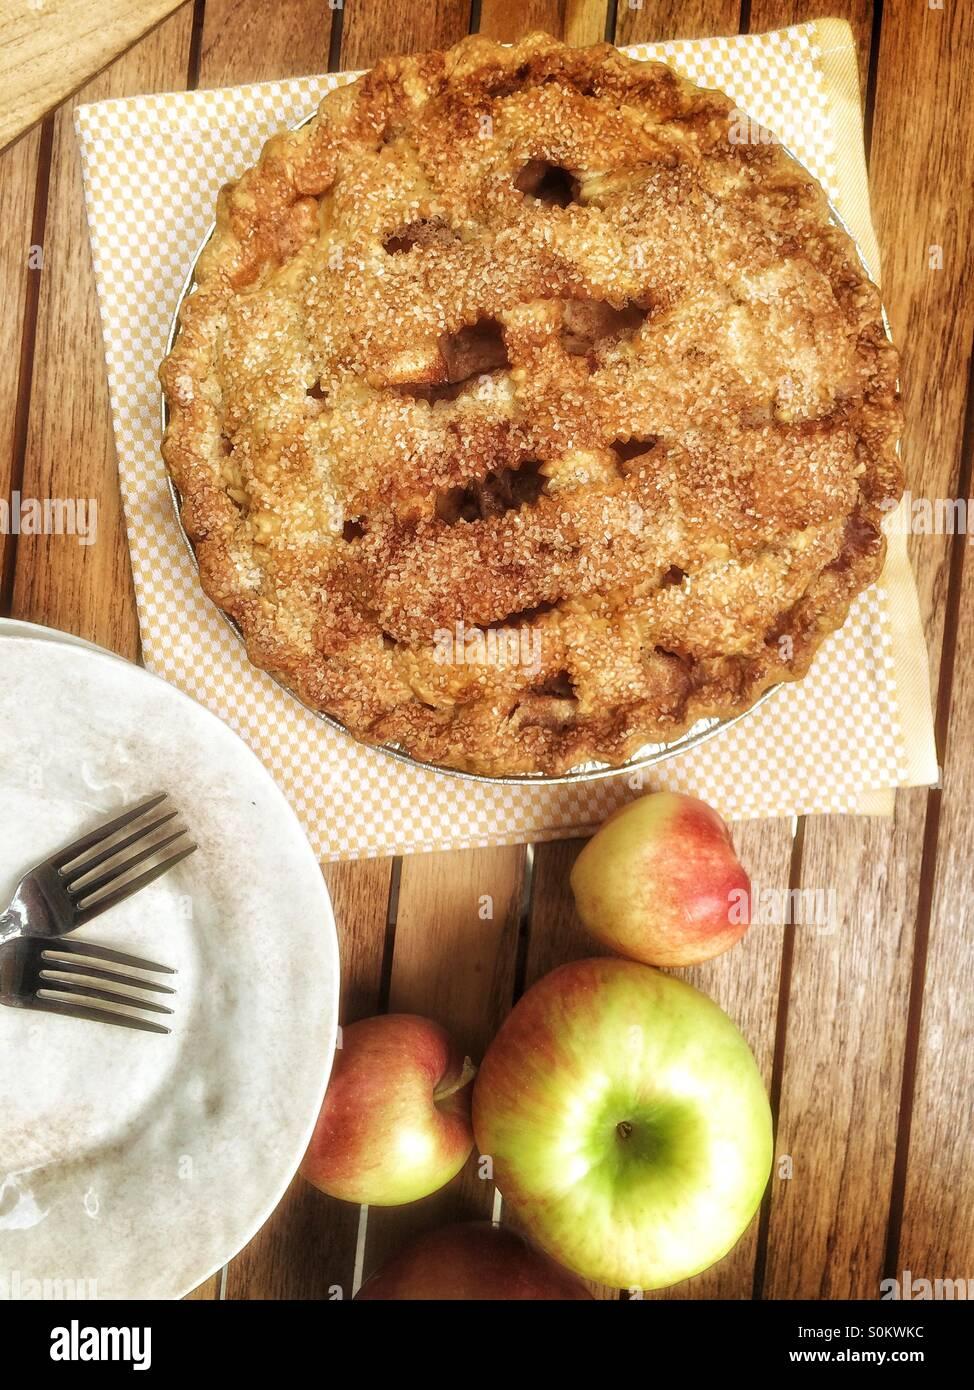 Apple pie with Massachusetts honeycrisp apples - Stock Image